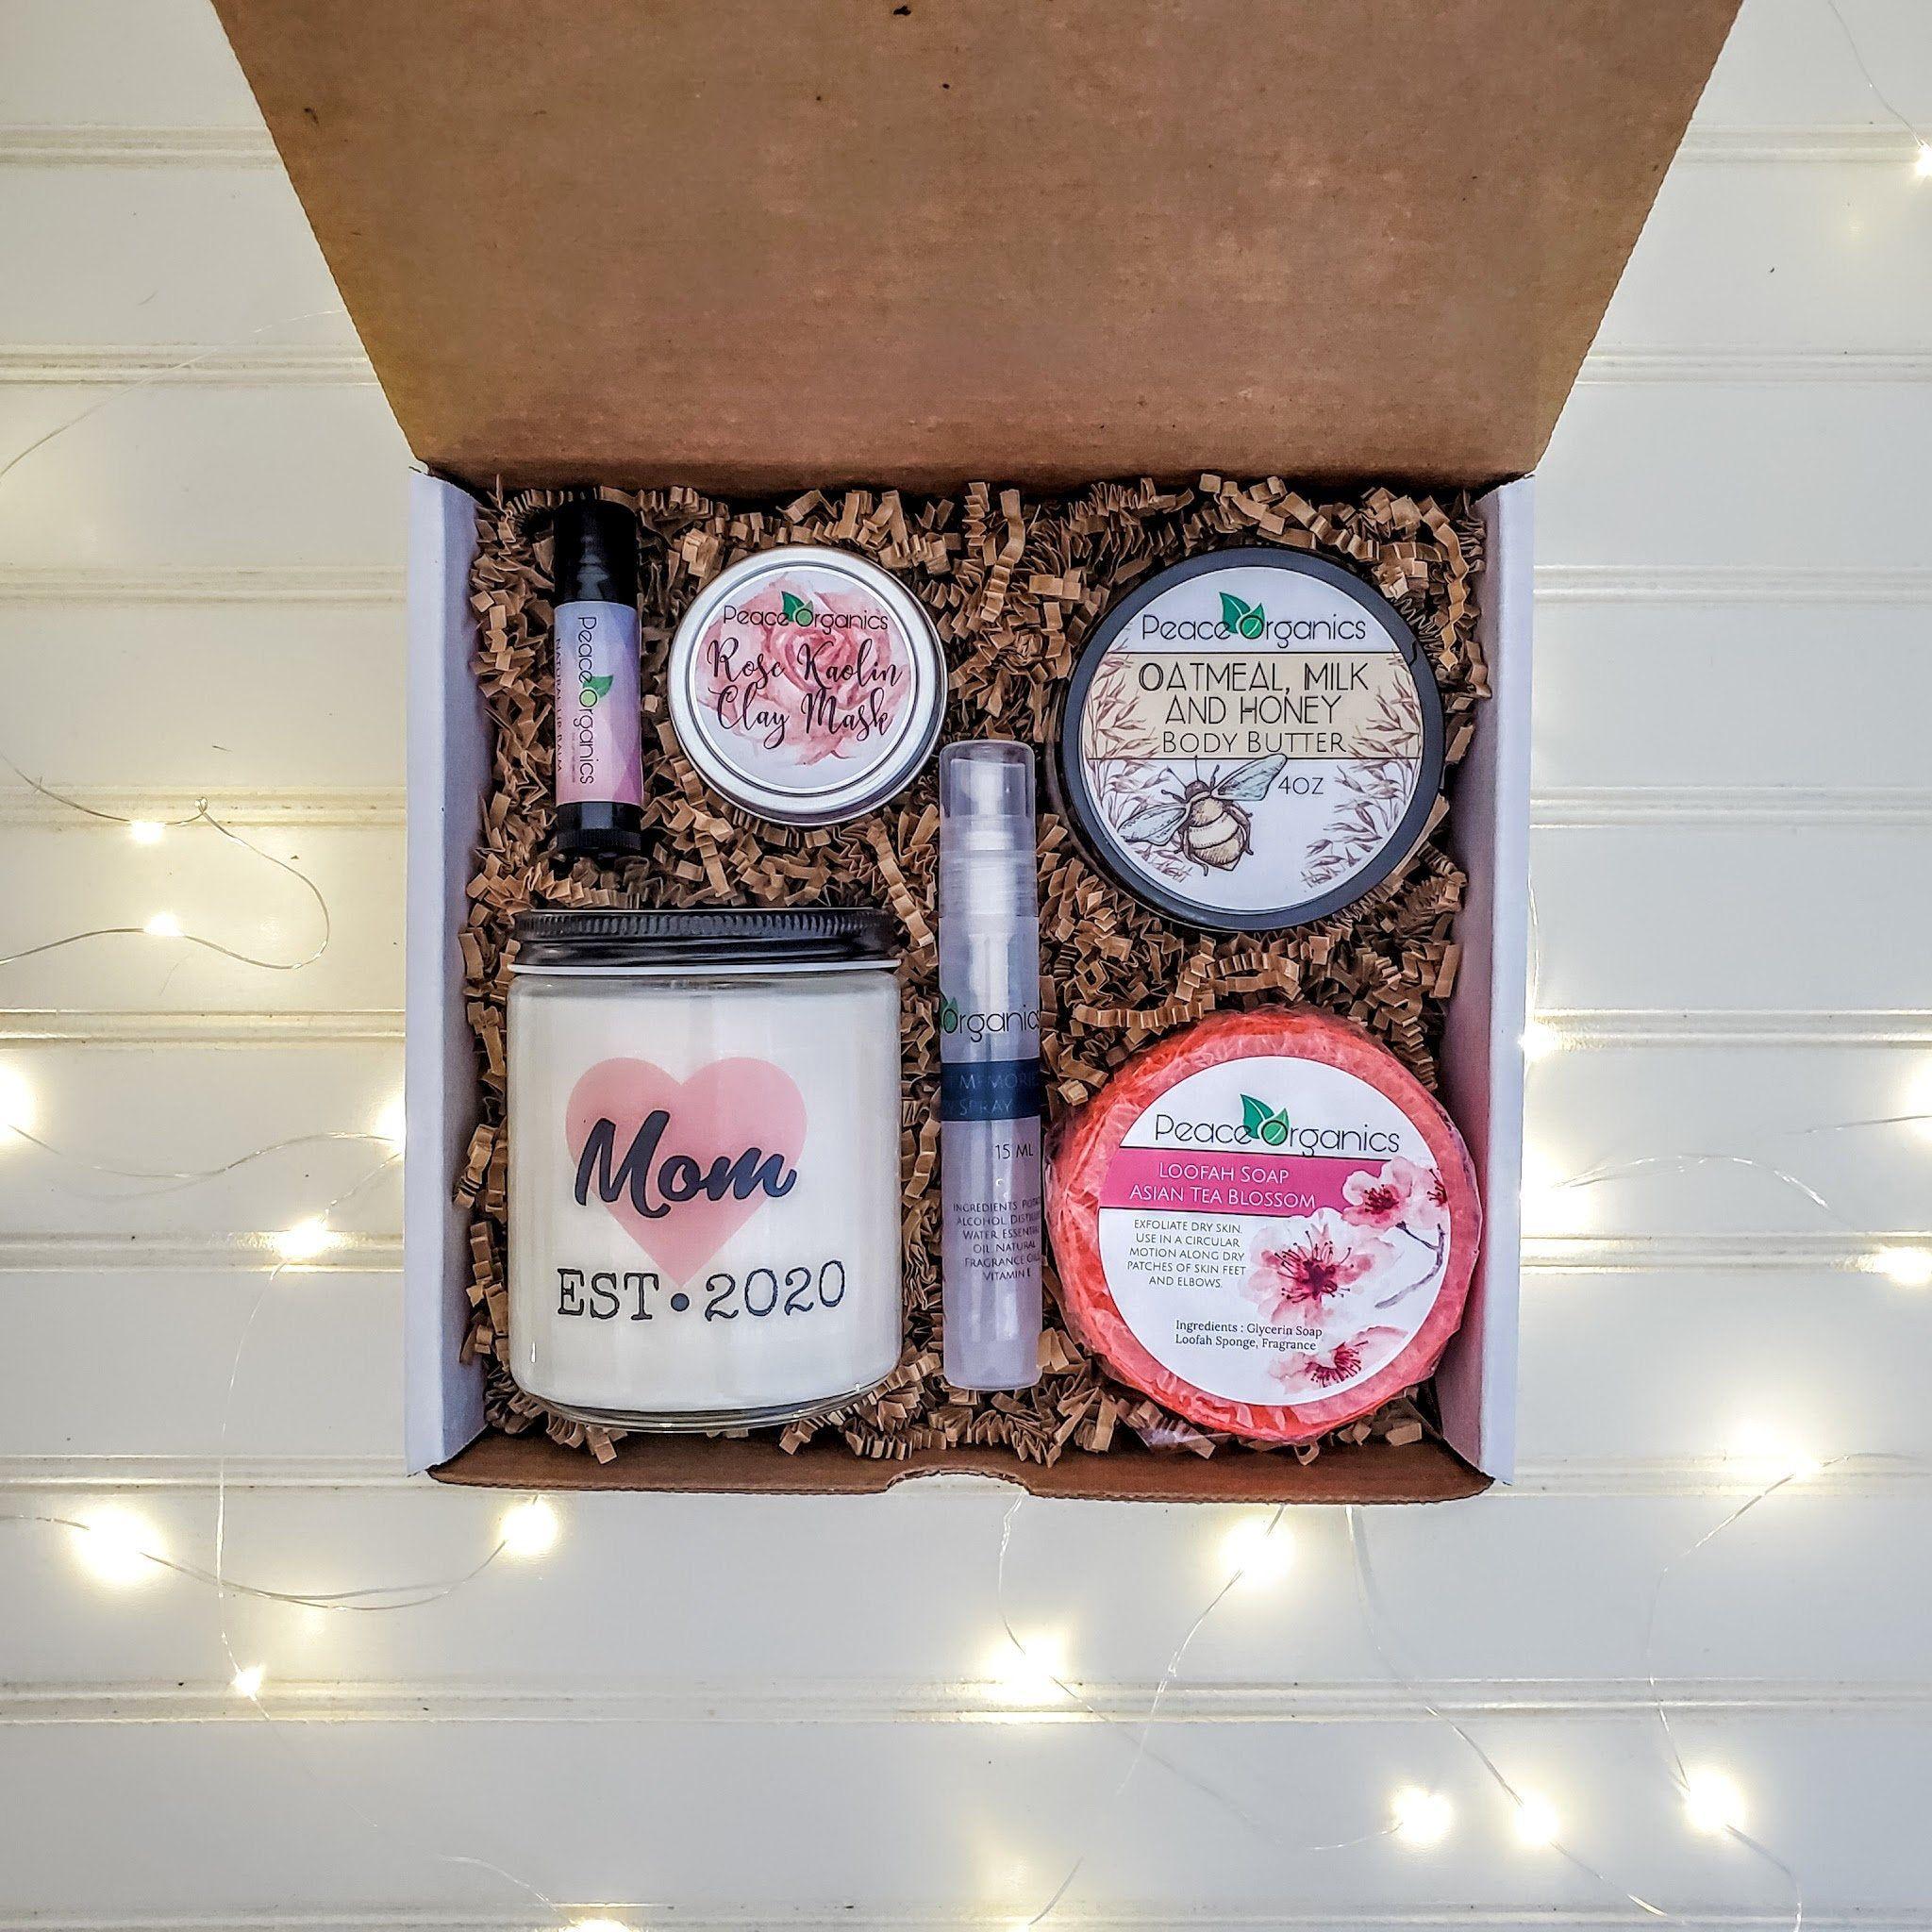 Mom est birthday gift box new mom gift new mother